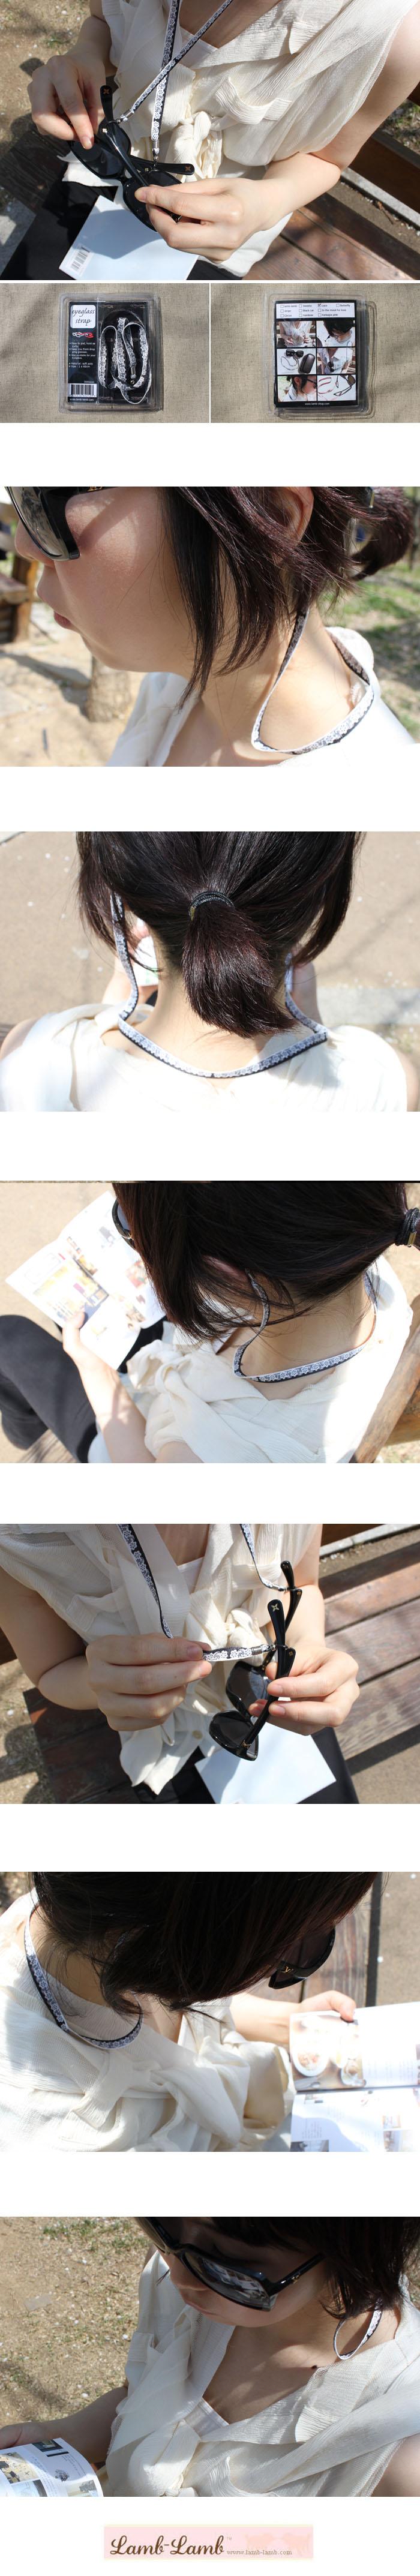 eyeglass strap -lace - 램램, 3,000원, 안경/선글라스, 안경